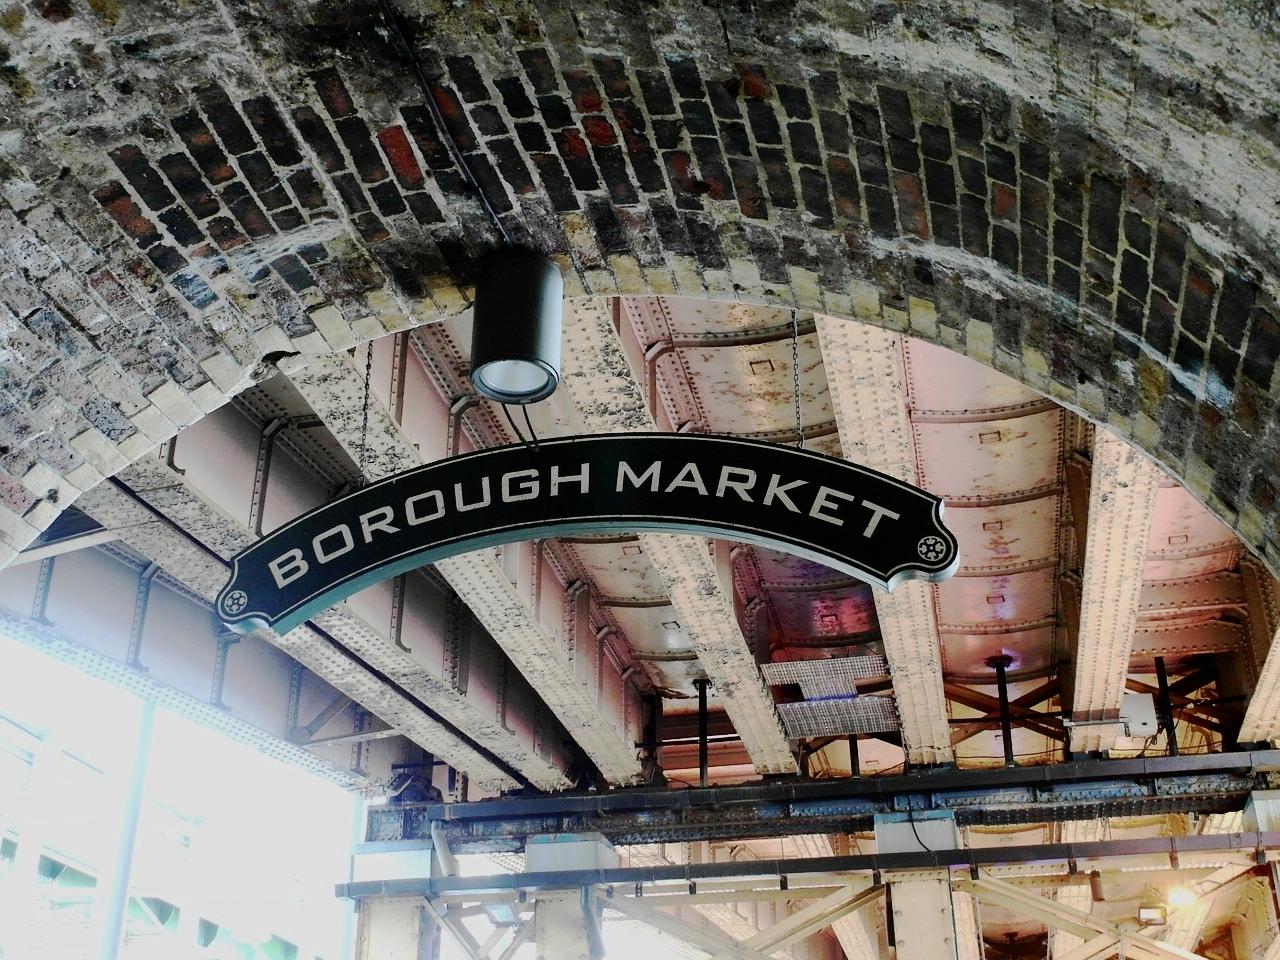 borough-market-678706_1280.jpg